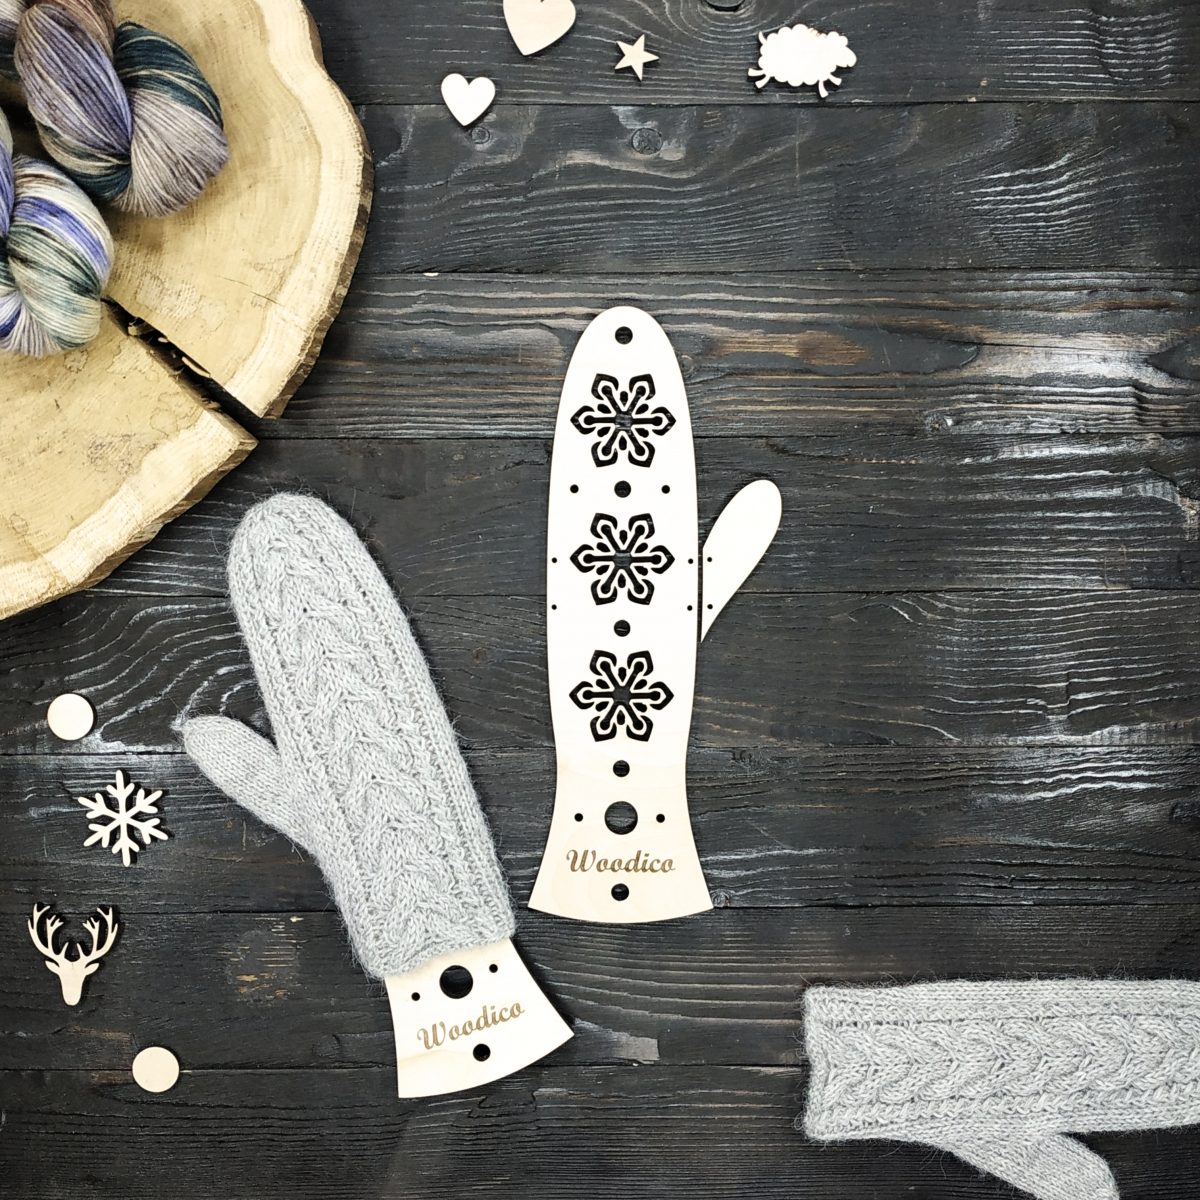 woodico.pro wooden mitten blockers crystal flakes 1200x1200 - Wooden mitten blockers / Crystal Flakes